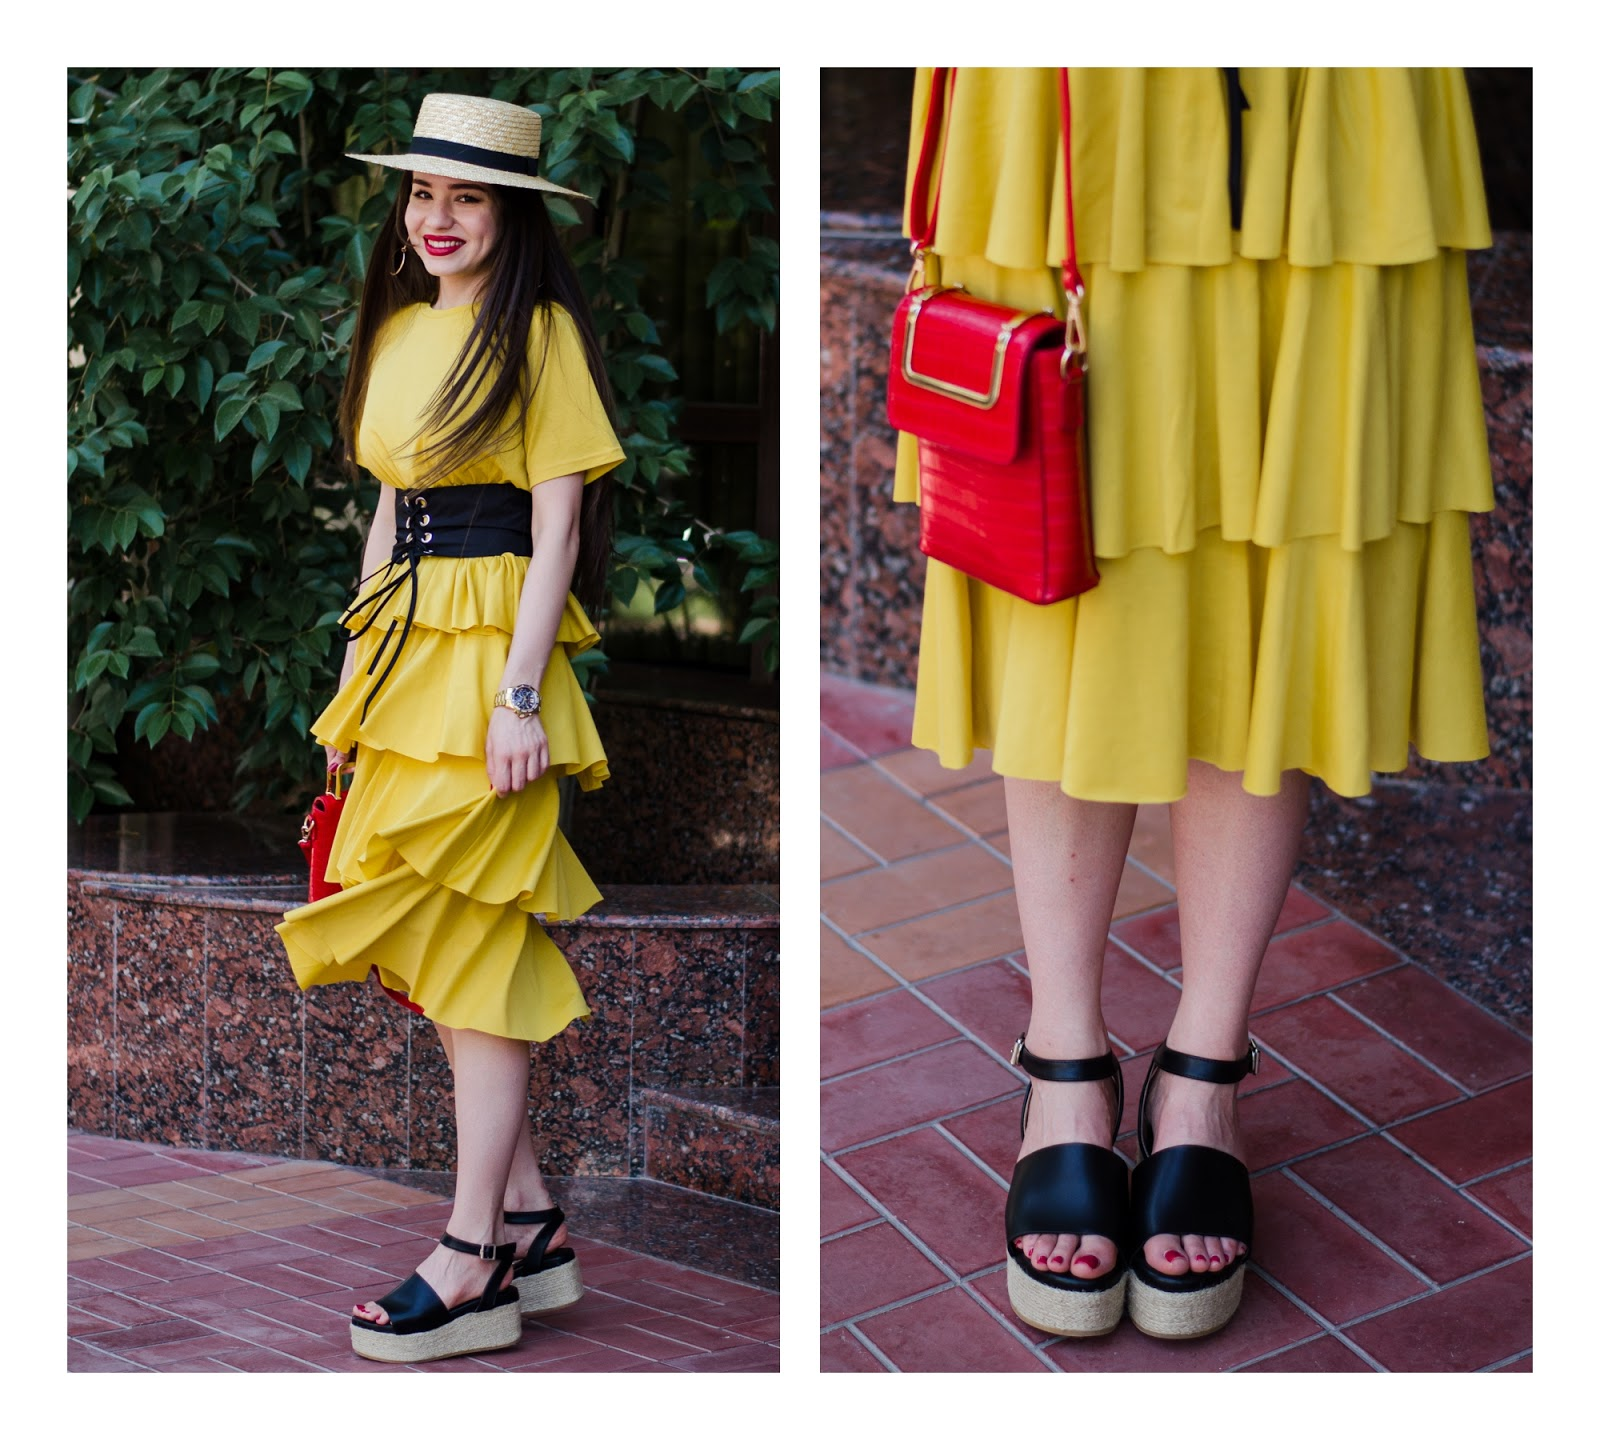 fashion blogger diyorasnotes diyora beta yellow dress summer dress ruffle dress midi corset straw hat asos summer look outfitoftheday